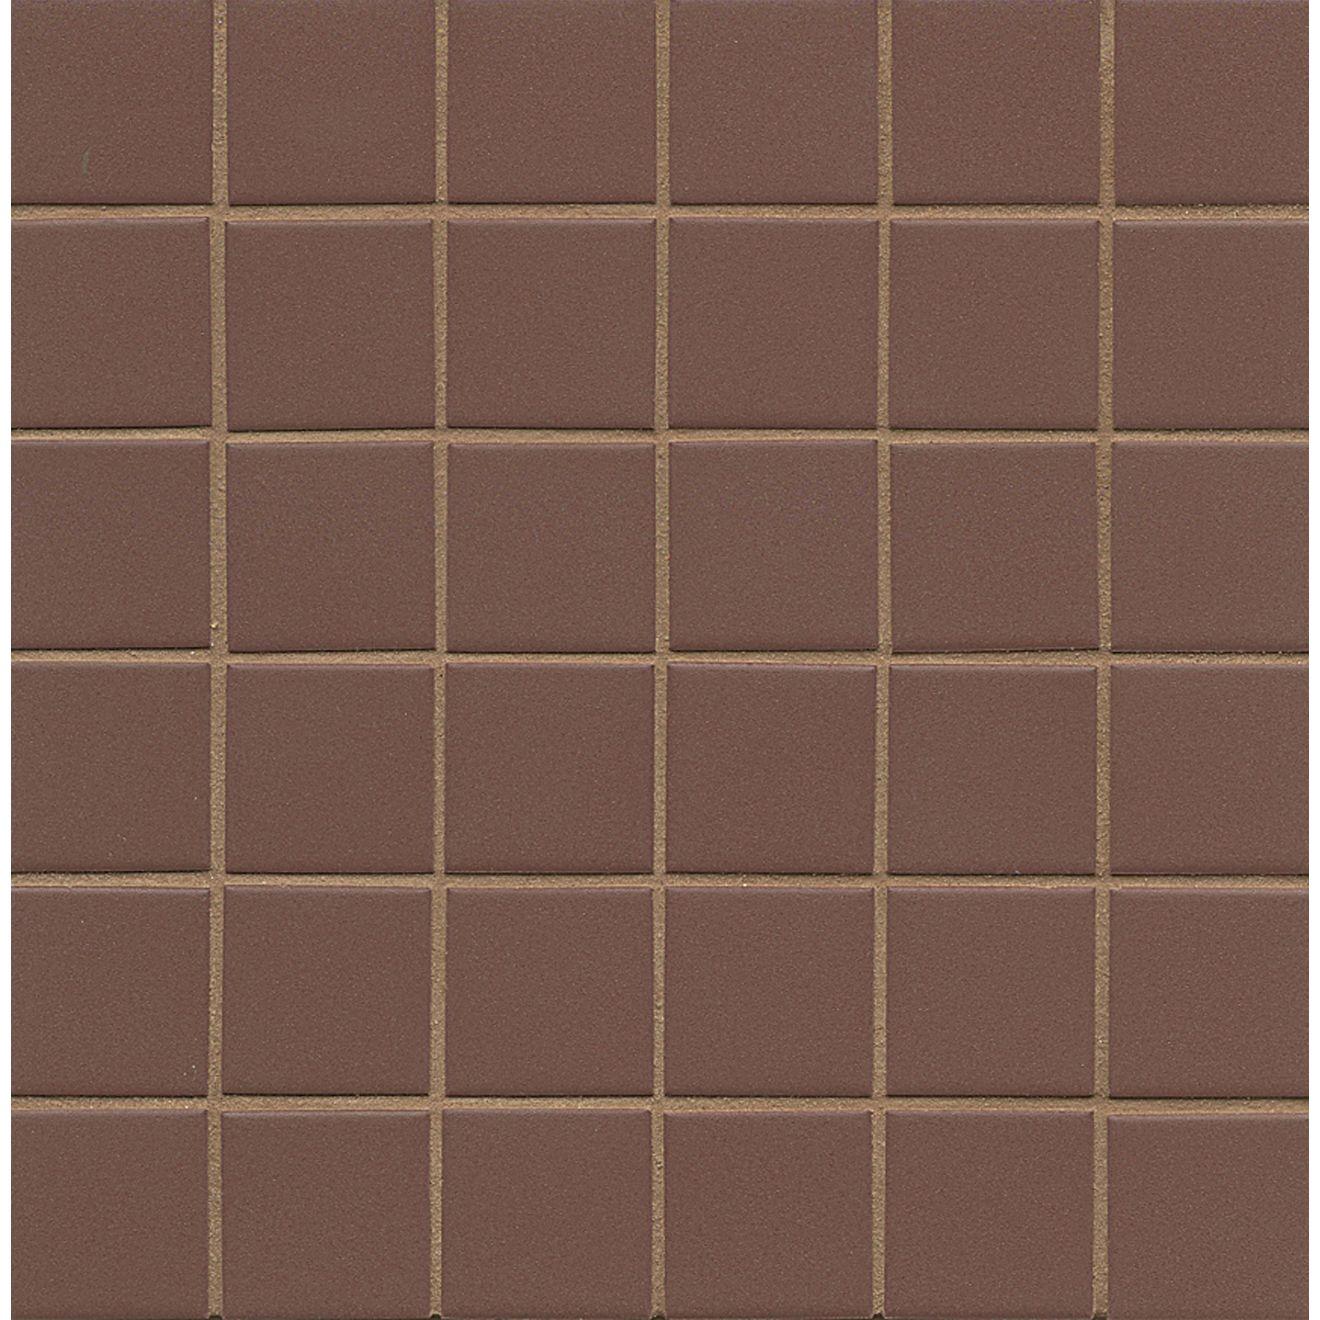 Elements Floor & Wall Mosaic in Brown